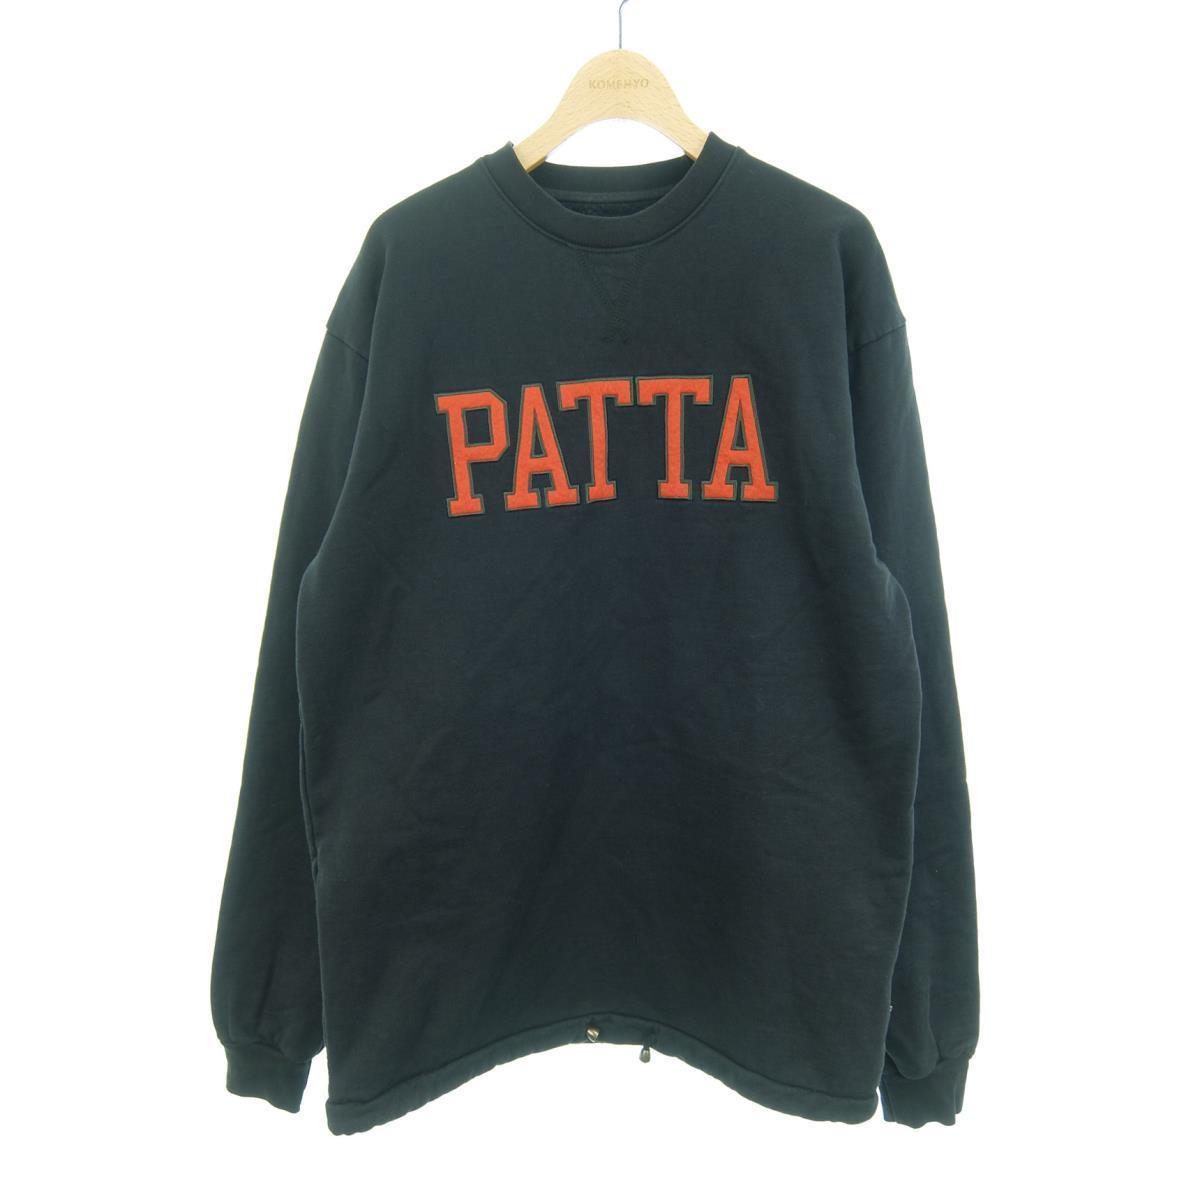 PATTA スウェット【中古】